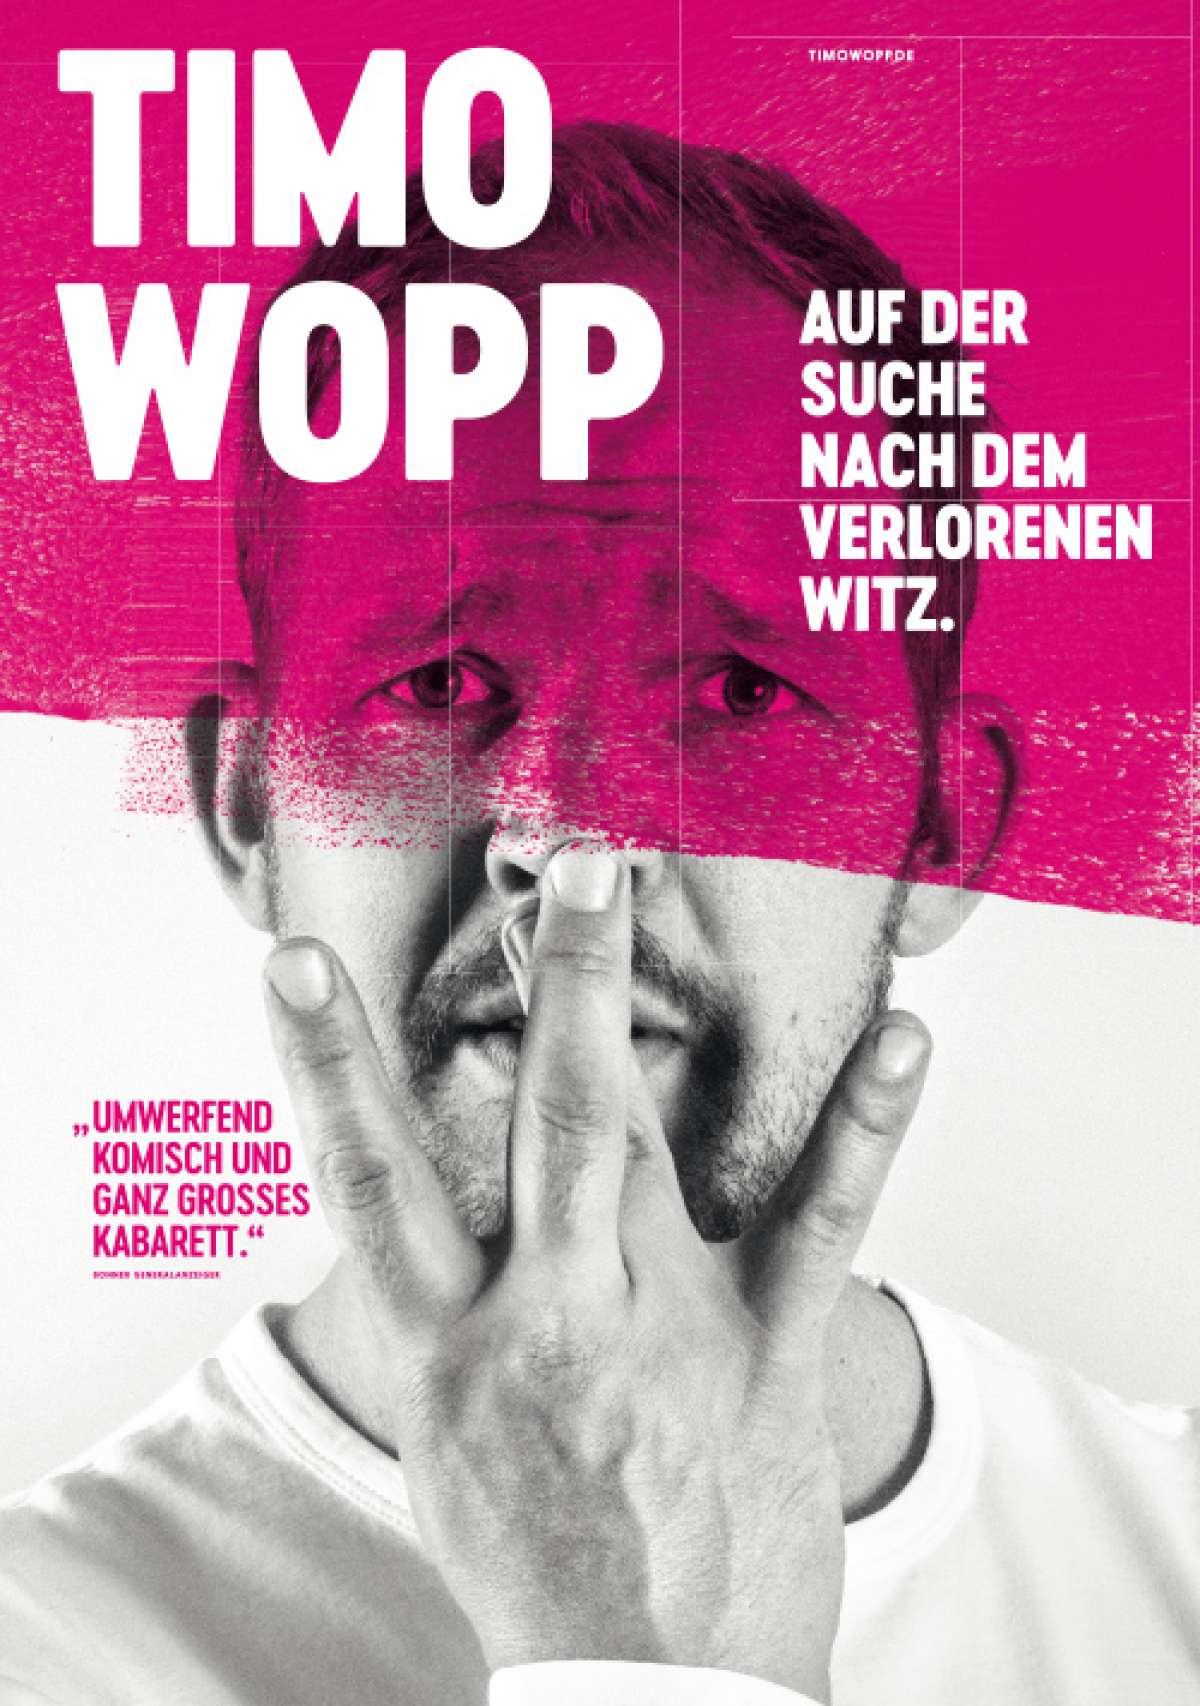 Timo Wopp - Stadthalle  - Baunatal